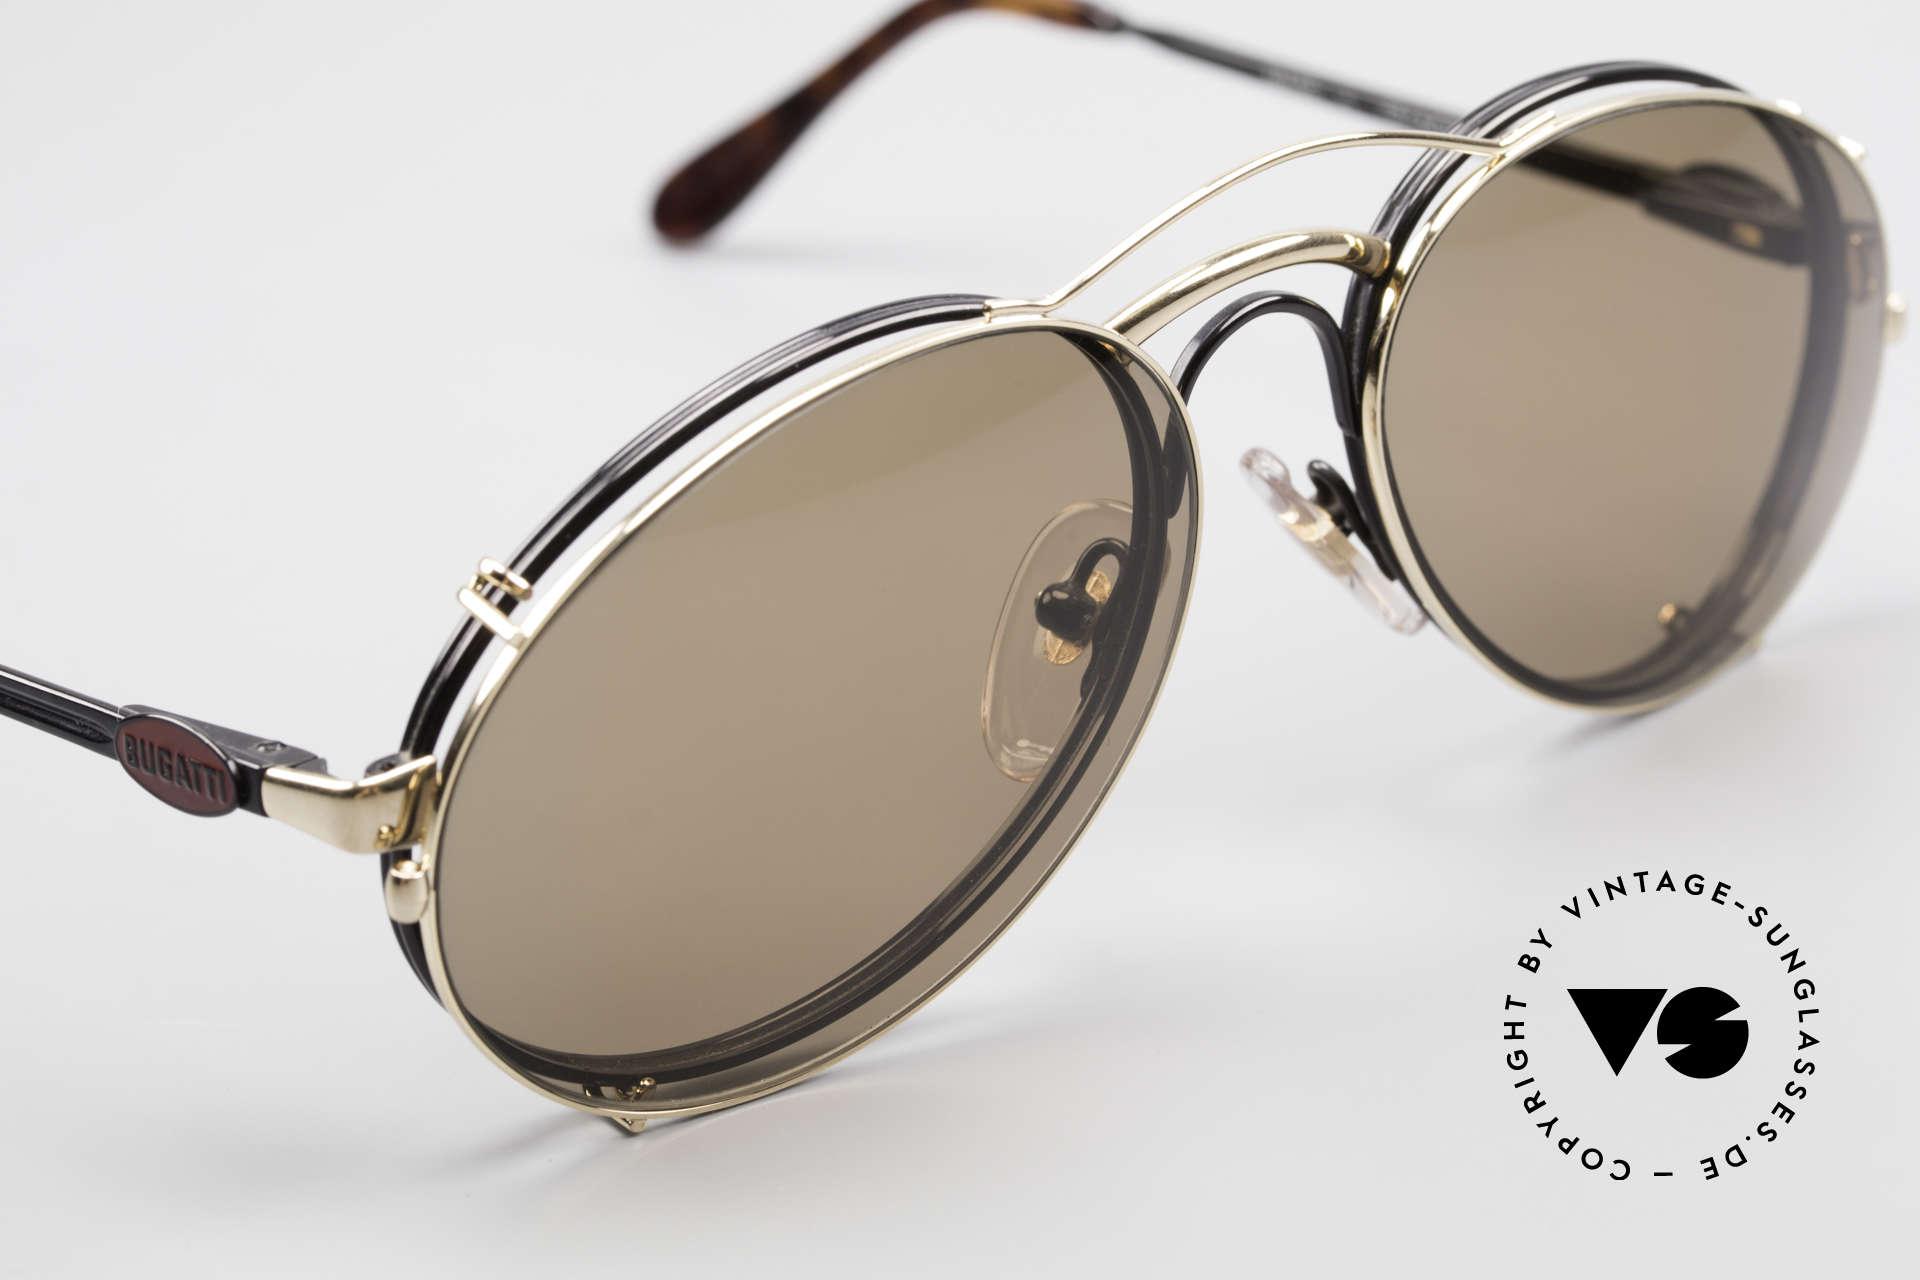 Bugatti 03326 Men's 80's Eyeglasses Clip On, unworn (like all our vintage Bugatti designer shades), Made for Men